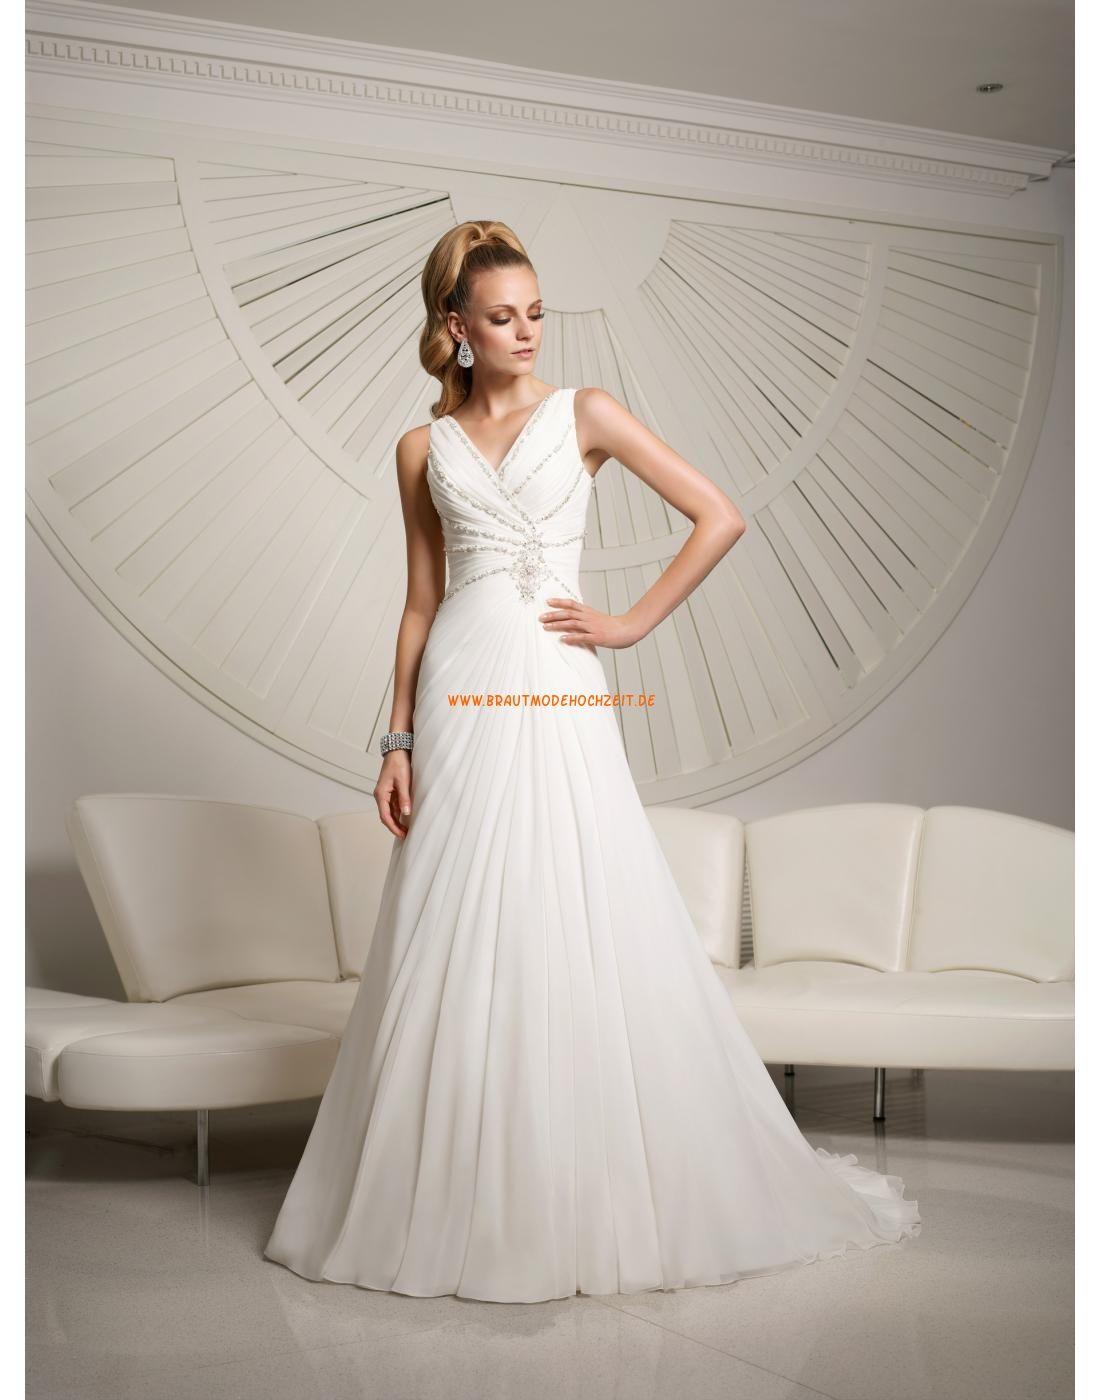 RONALD JOYCE A-linie Traumhafte Hochzeitskleider aus Chiffon